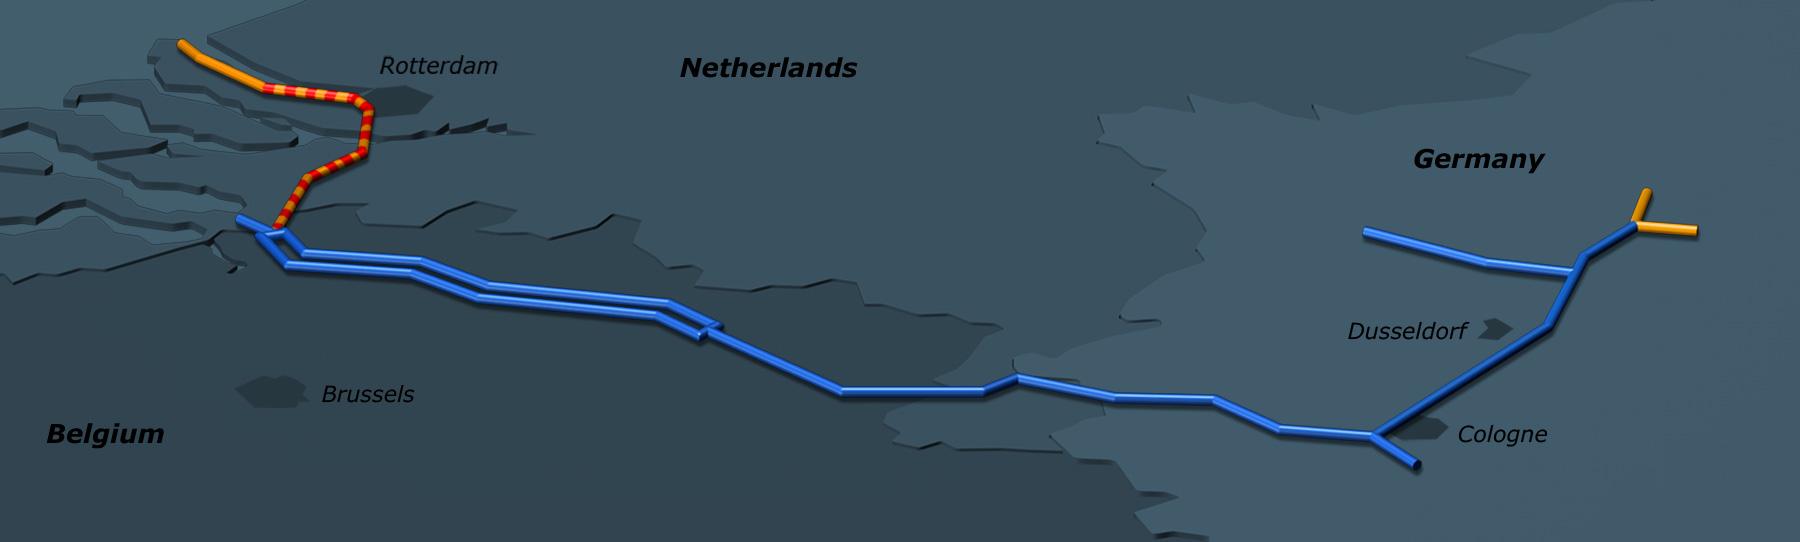 ARG | Ethylene pipeline in Germany, Belgium and the Netherlands